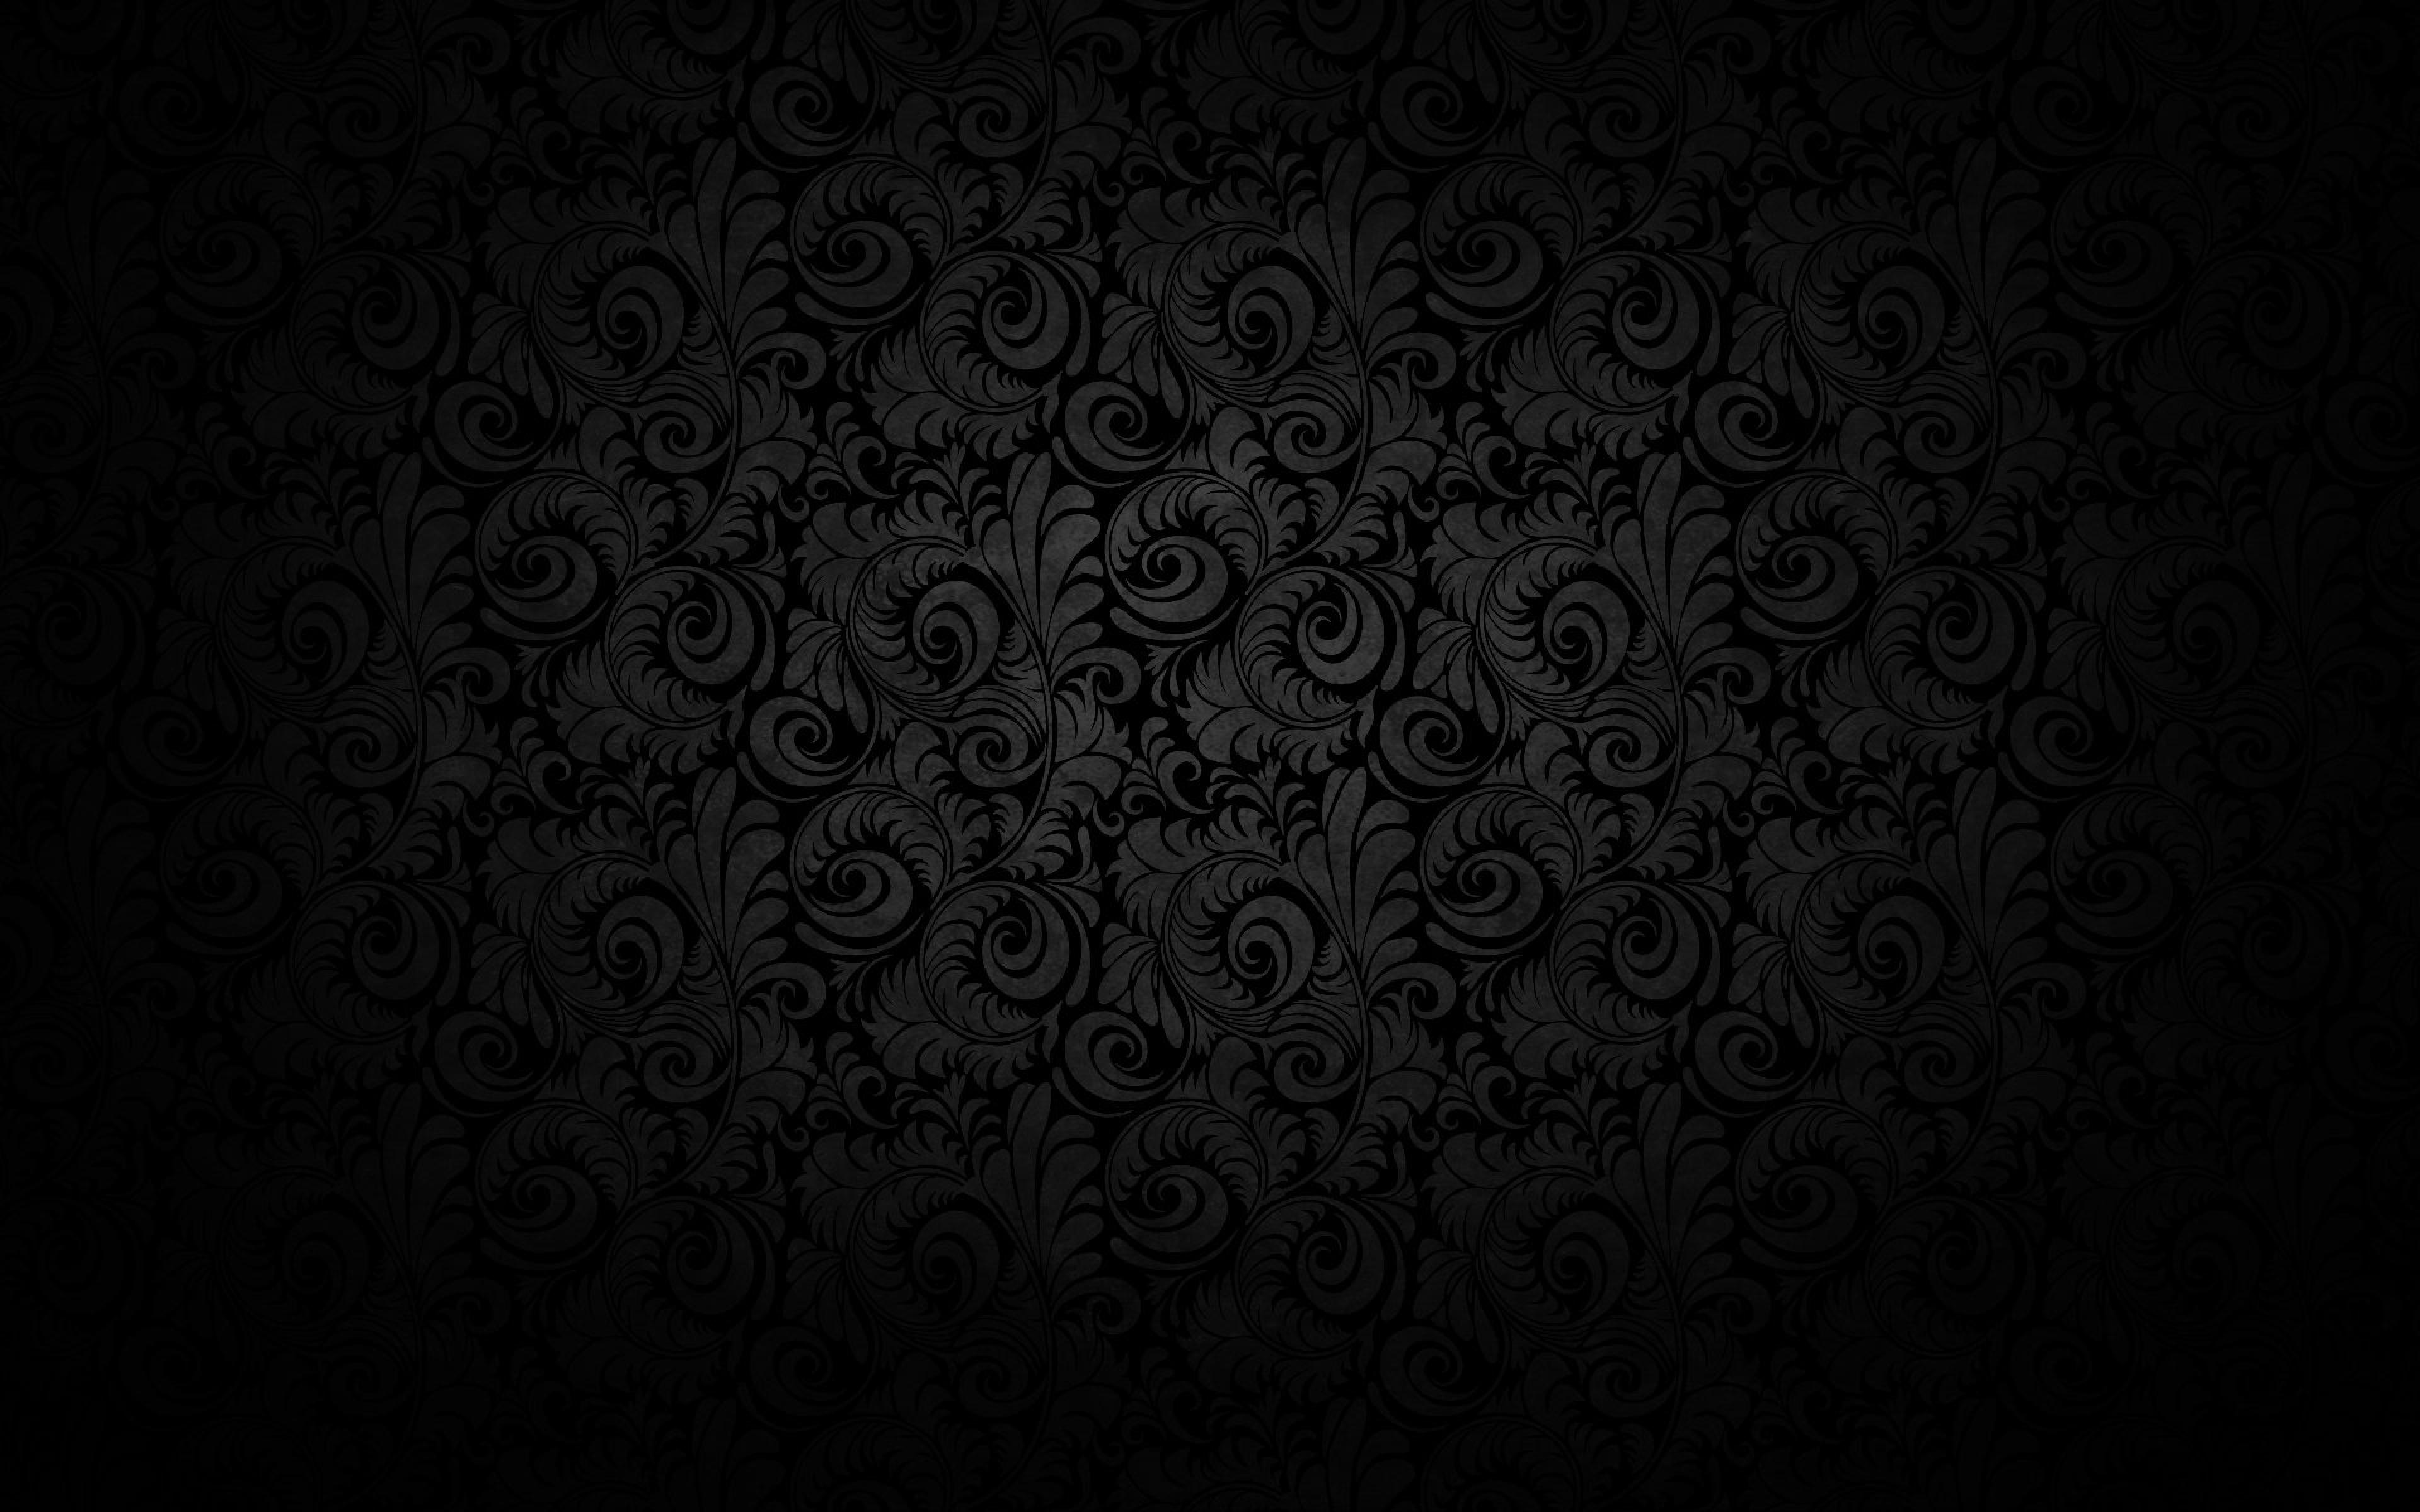 black-background-1024x640